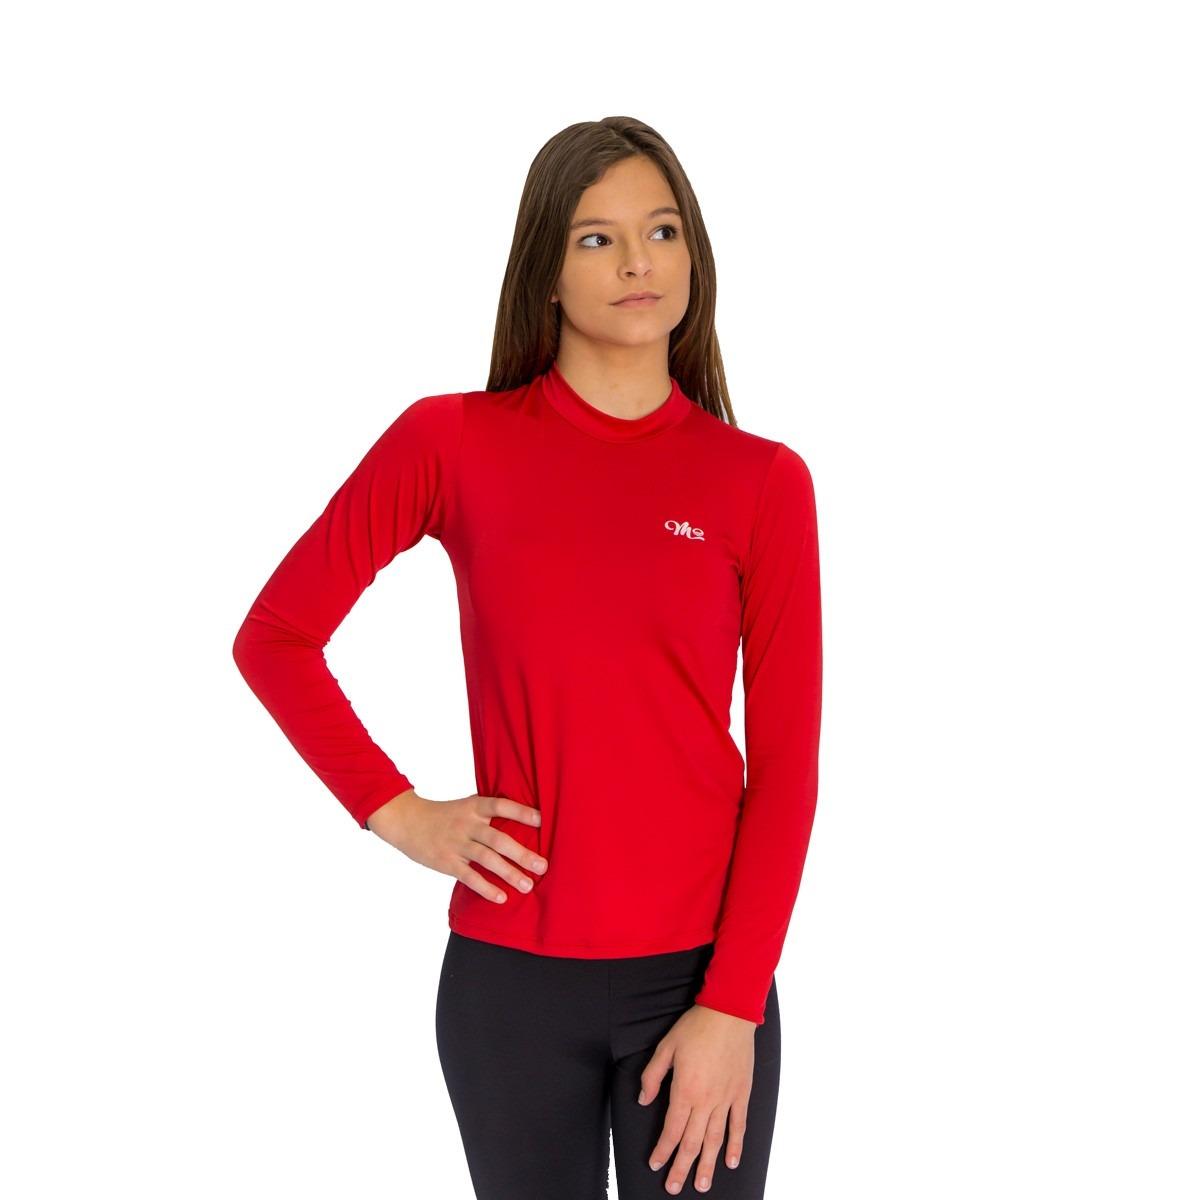 camiseta térmica manga longa feminina gola alta vermelha. Carregando zoom. fa3a0eee56a0b